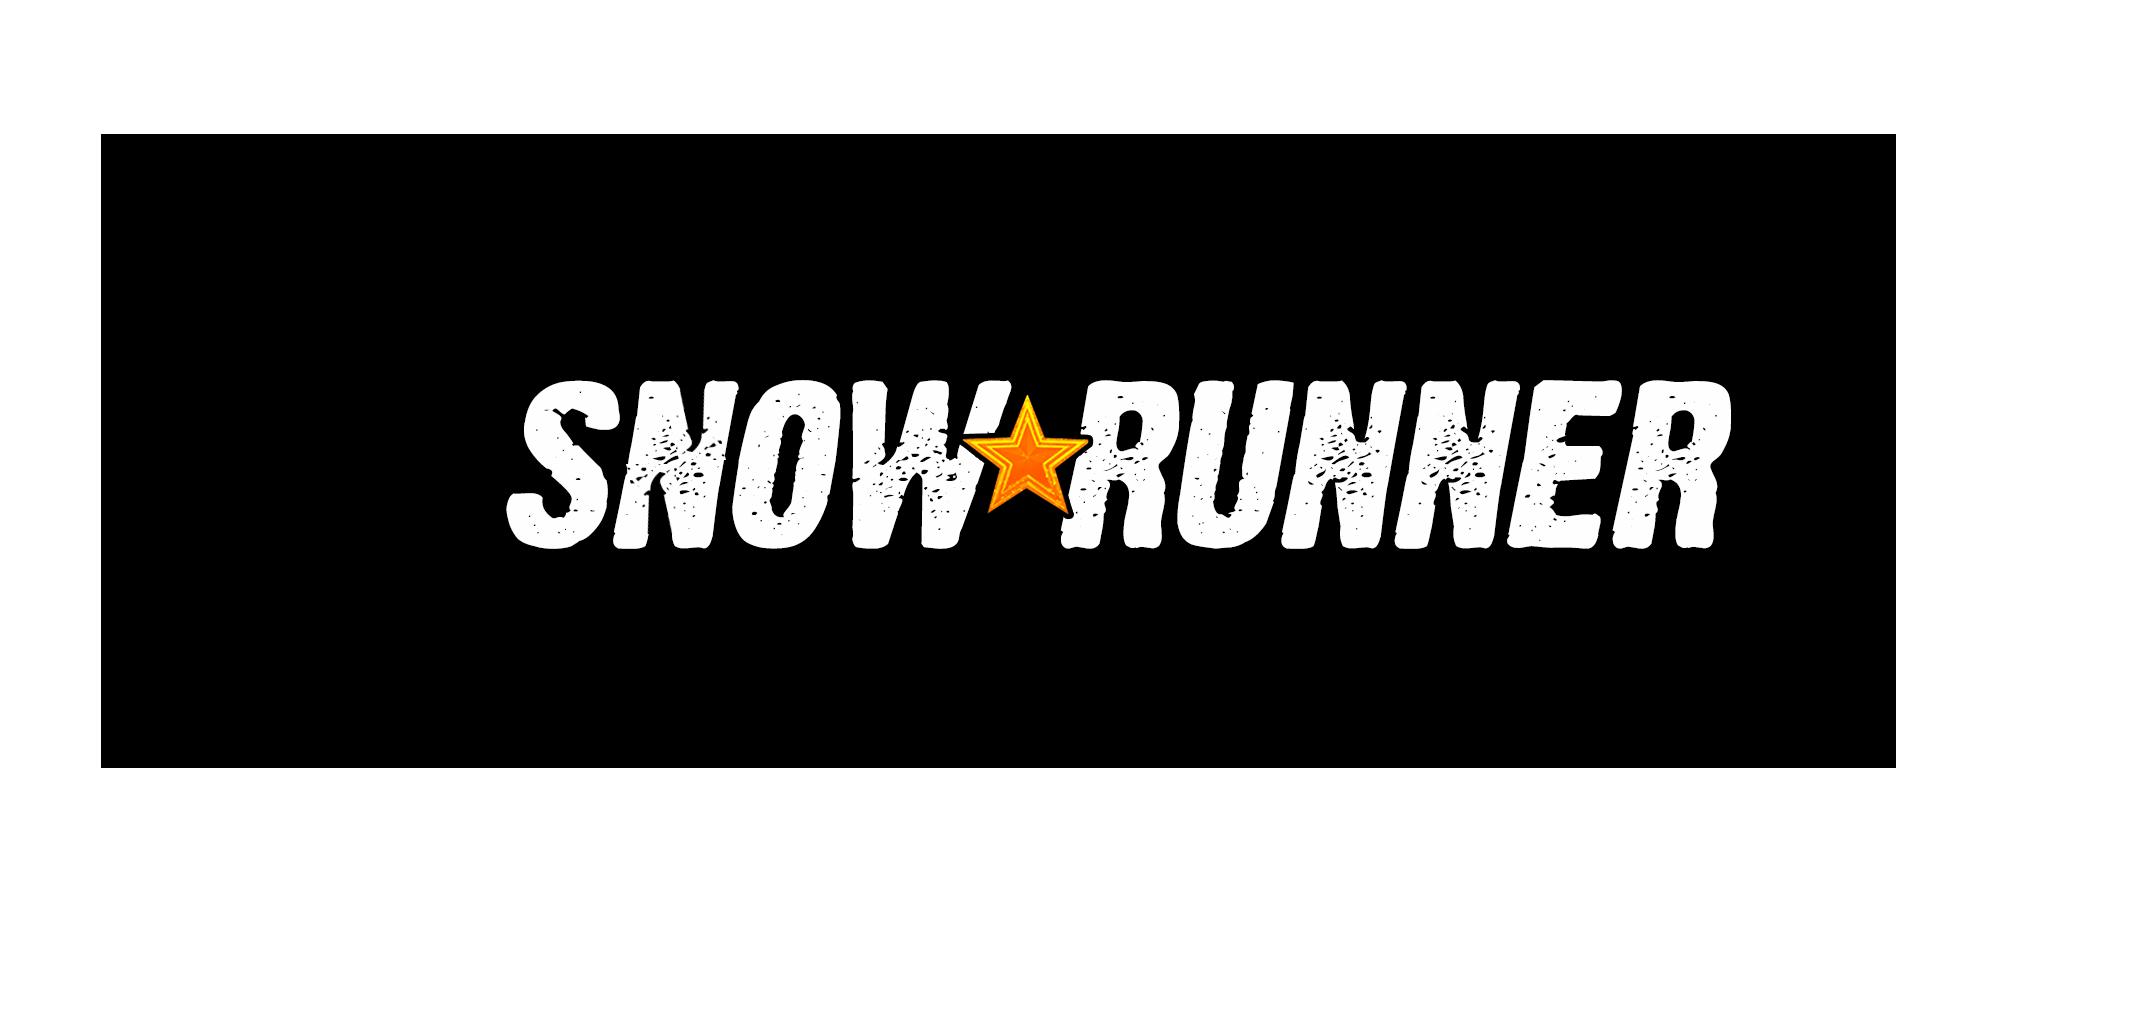 SnowRunner - Informacje podsumowujące